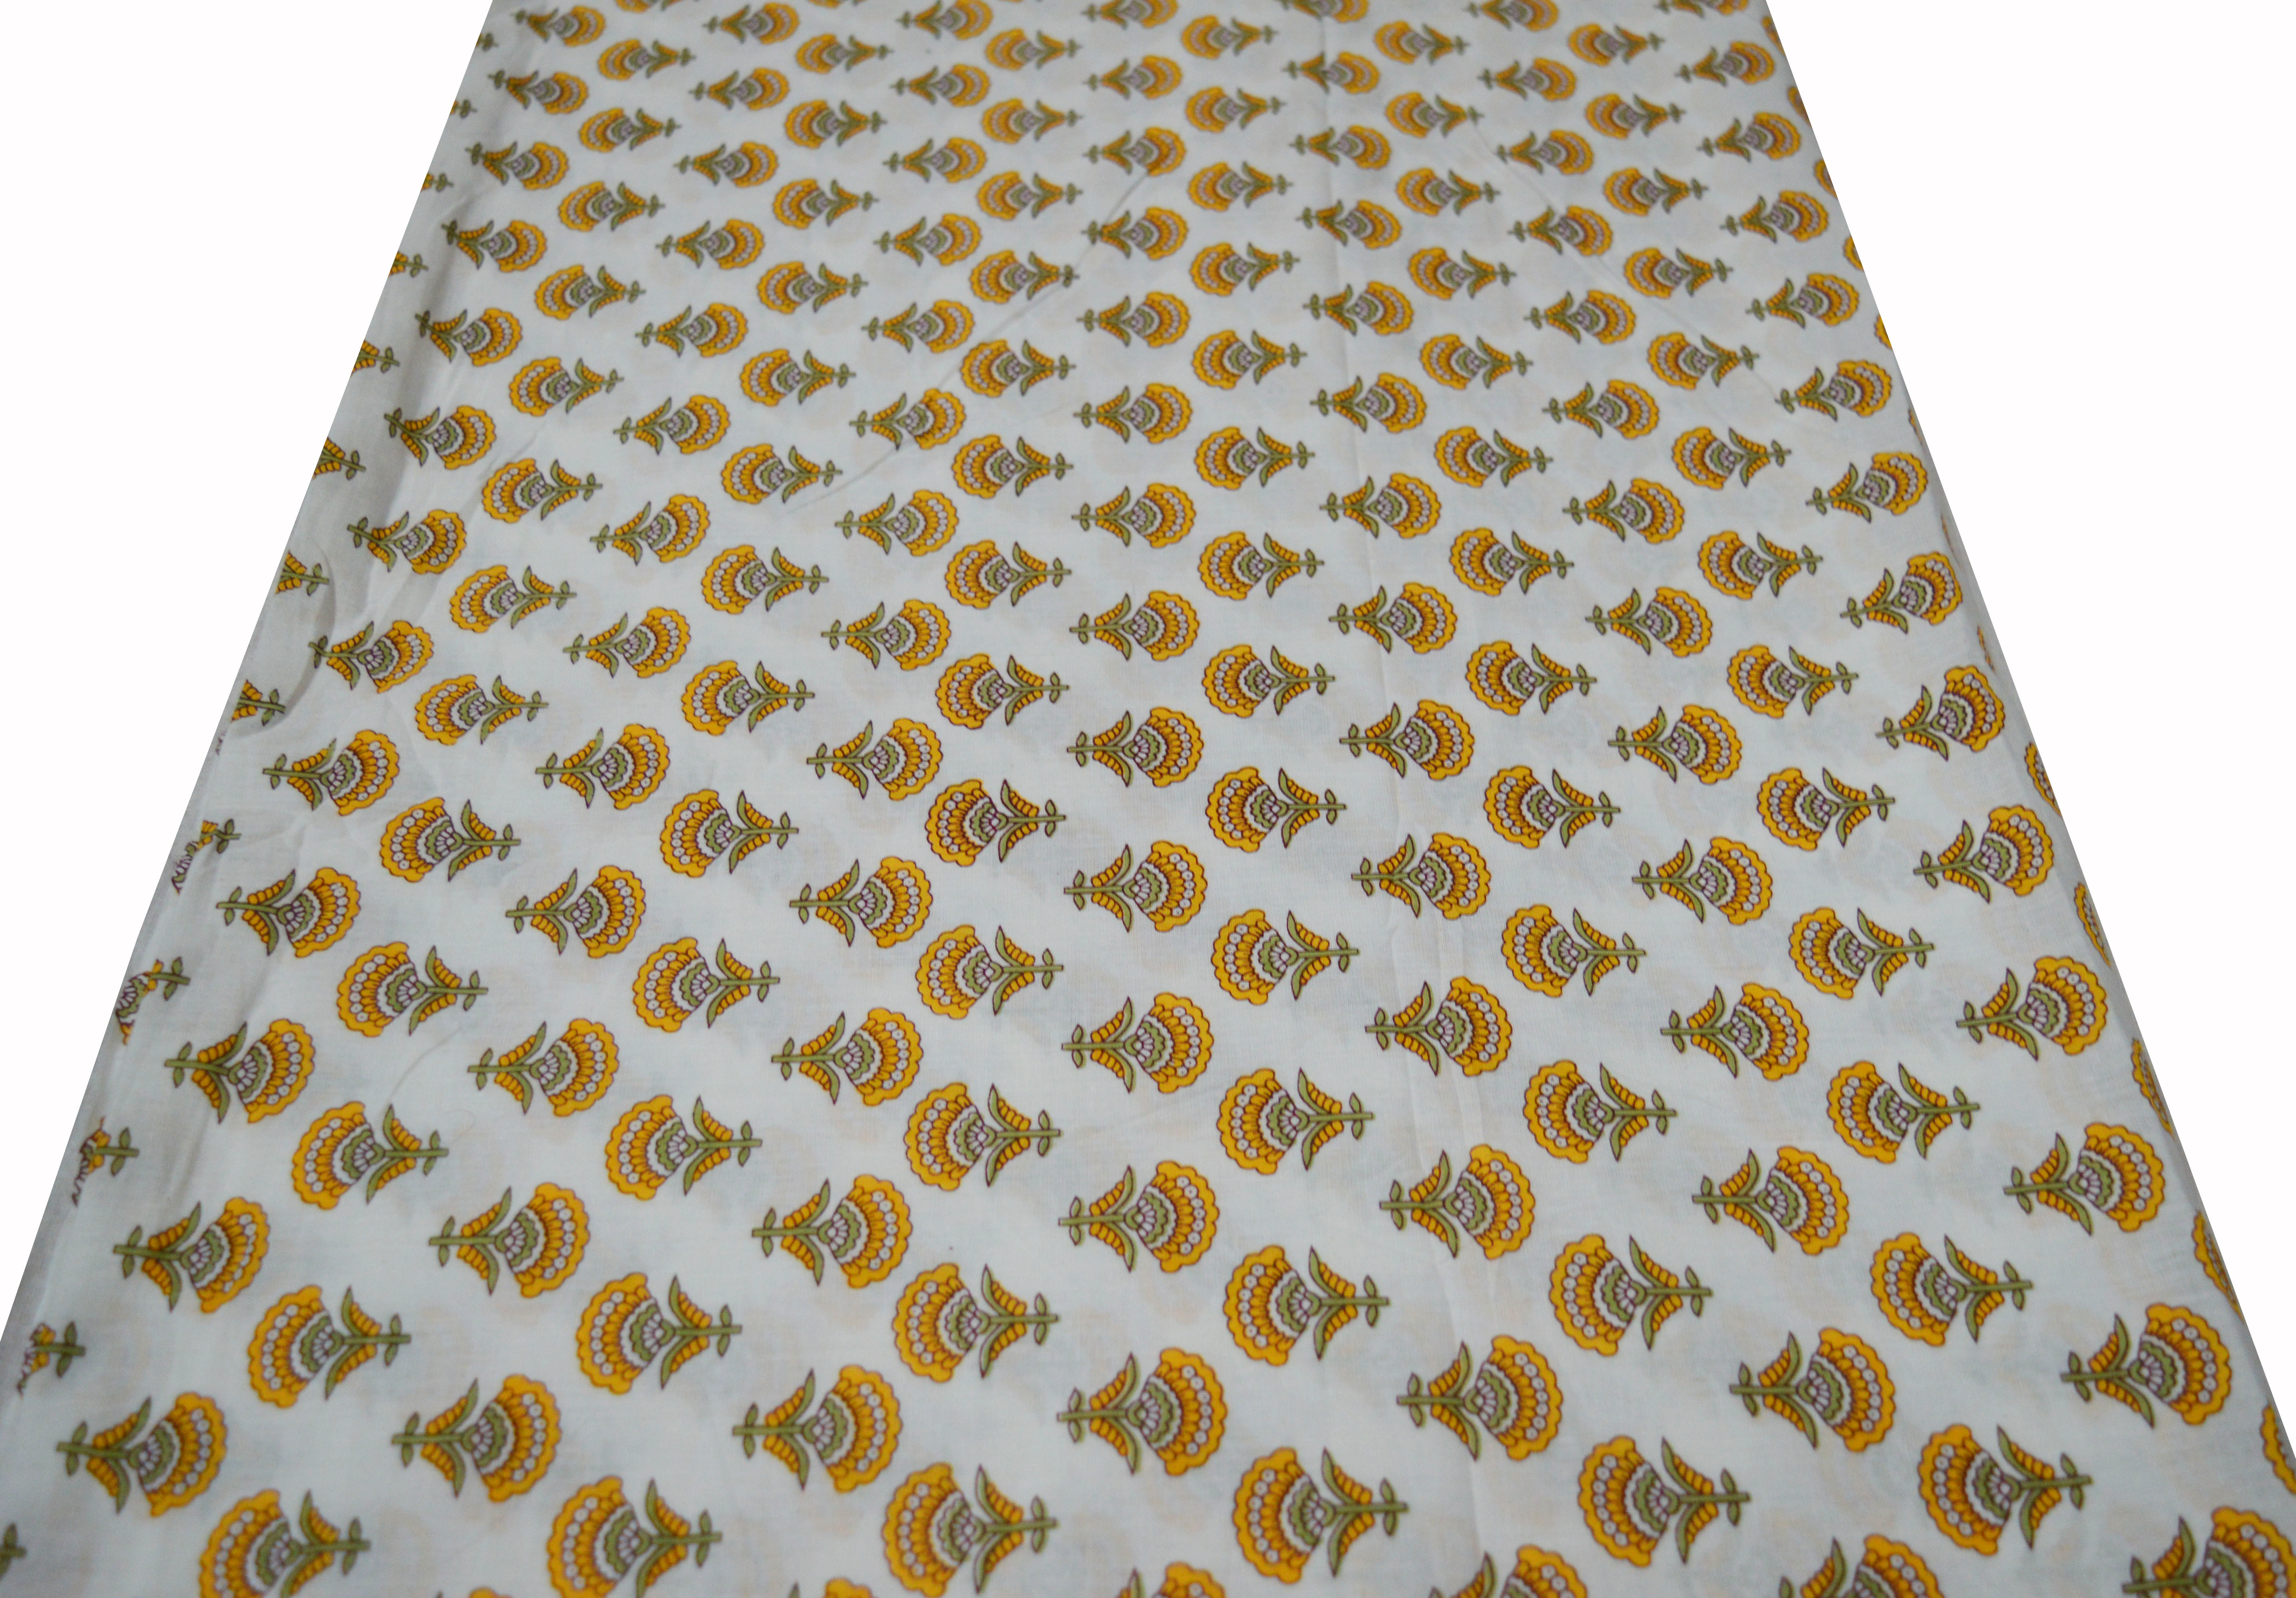 Dressmaking Home Decor Craft Material Fabric